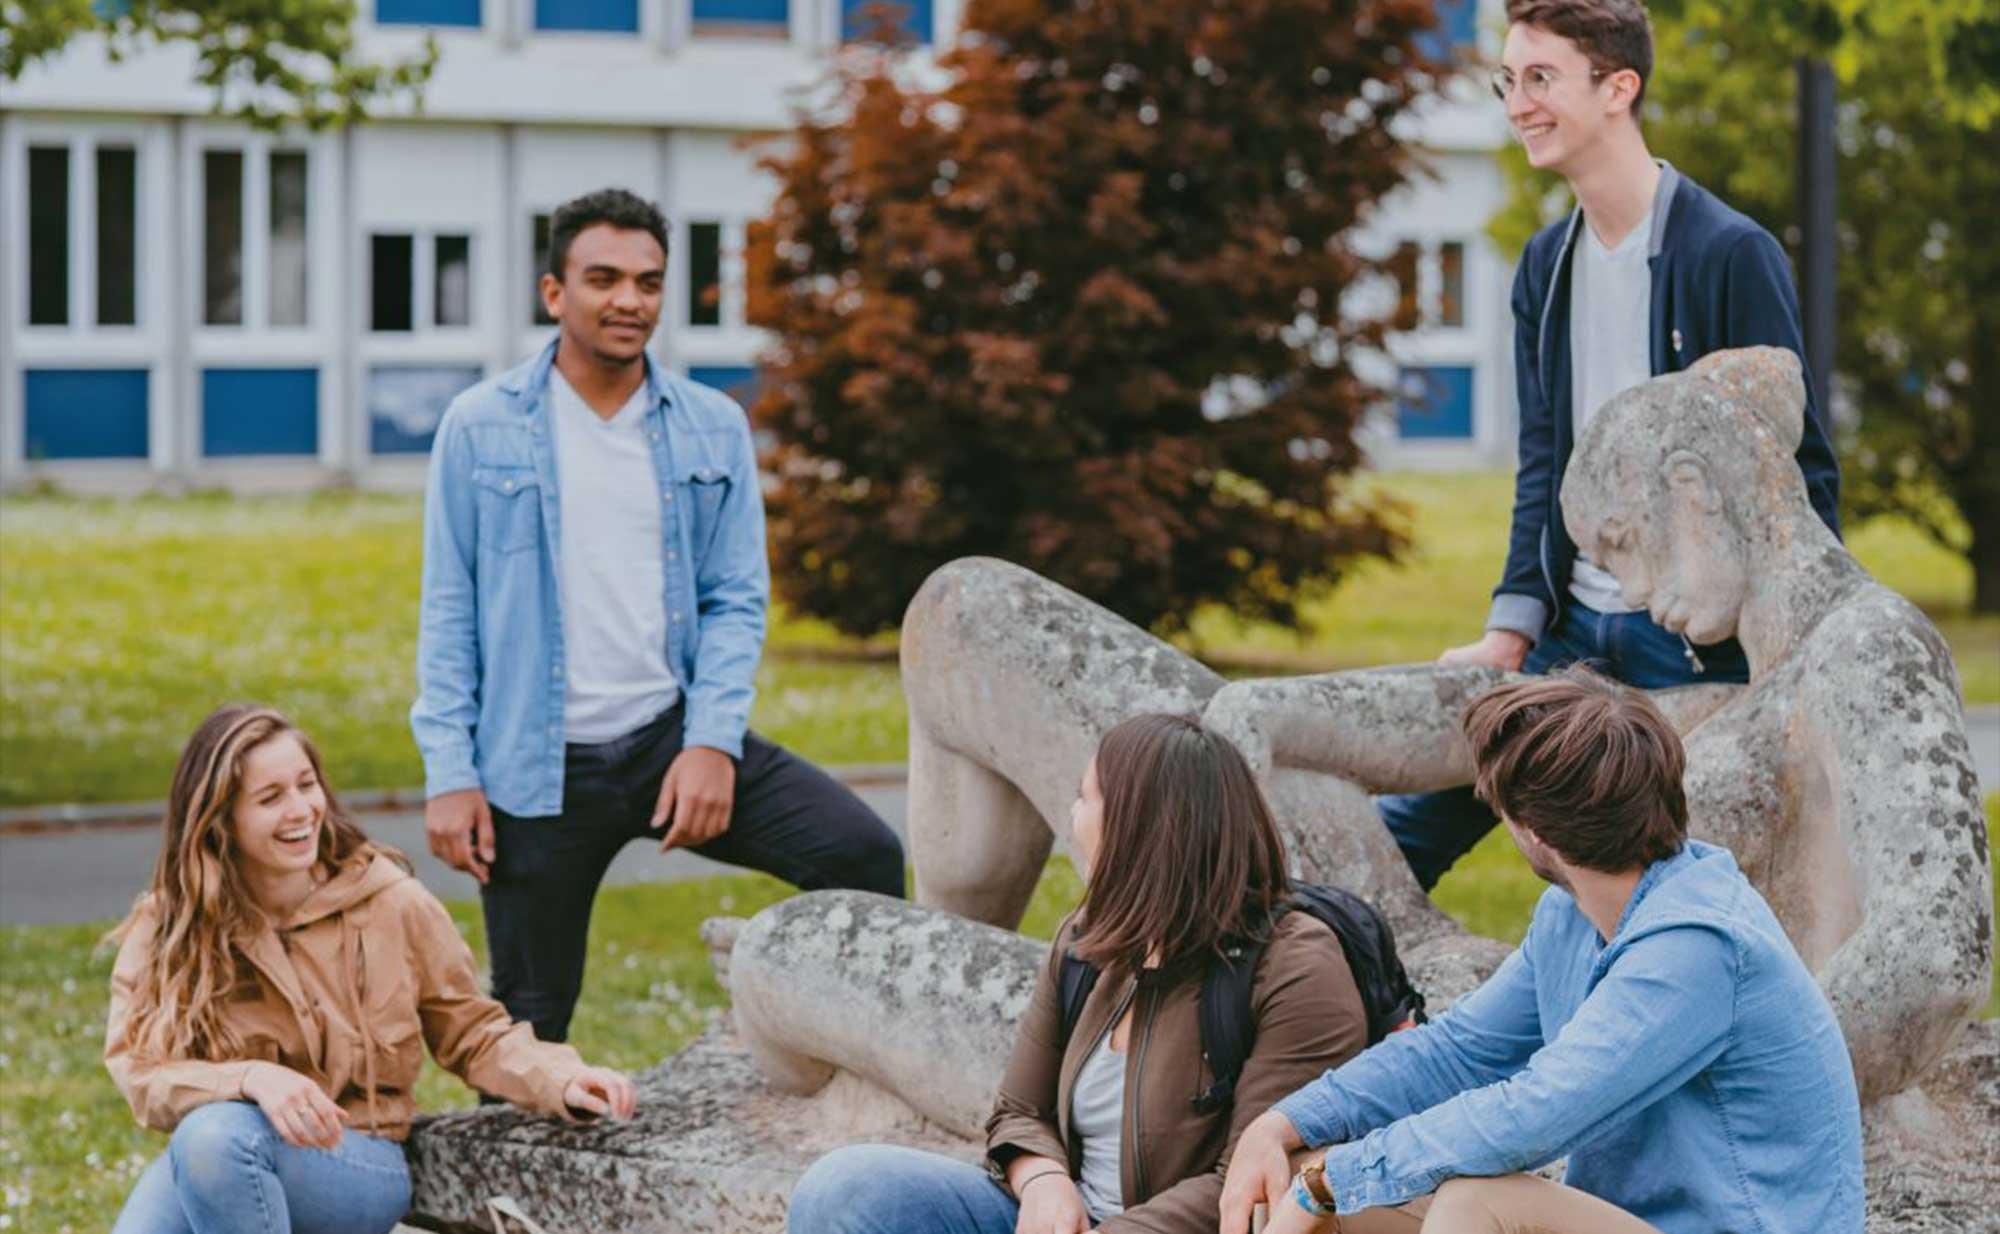 ECIU University is launching a student community platform